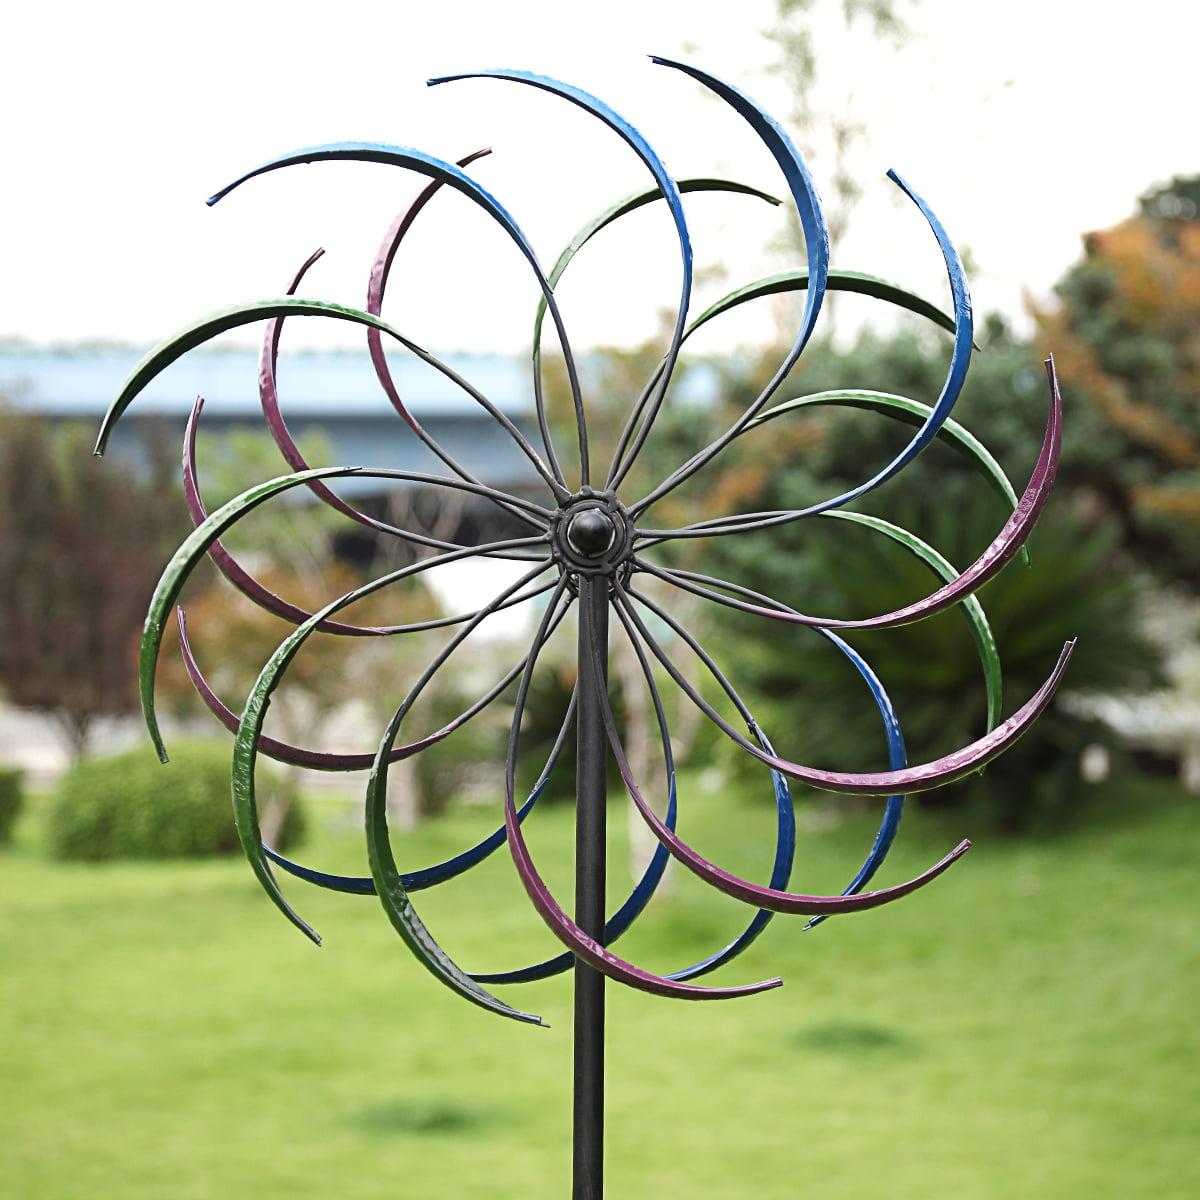 "Metal Kinetic Rainbow Wind Spinner Yard Art Double Spiral Garden Ornaments 79"" H"